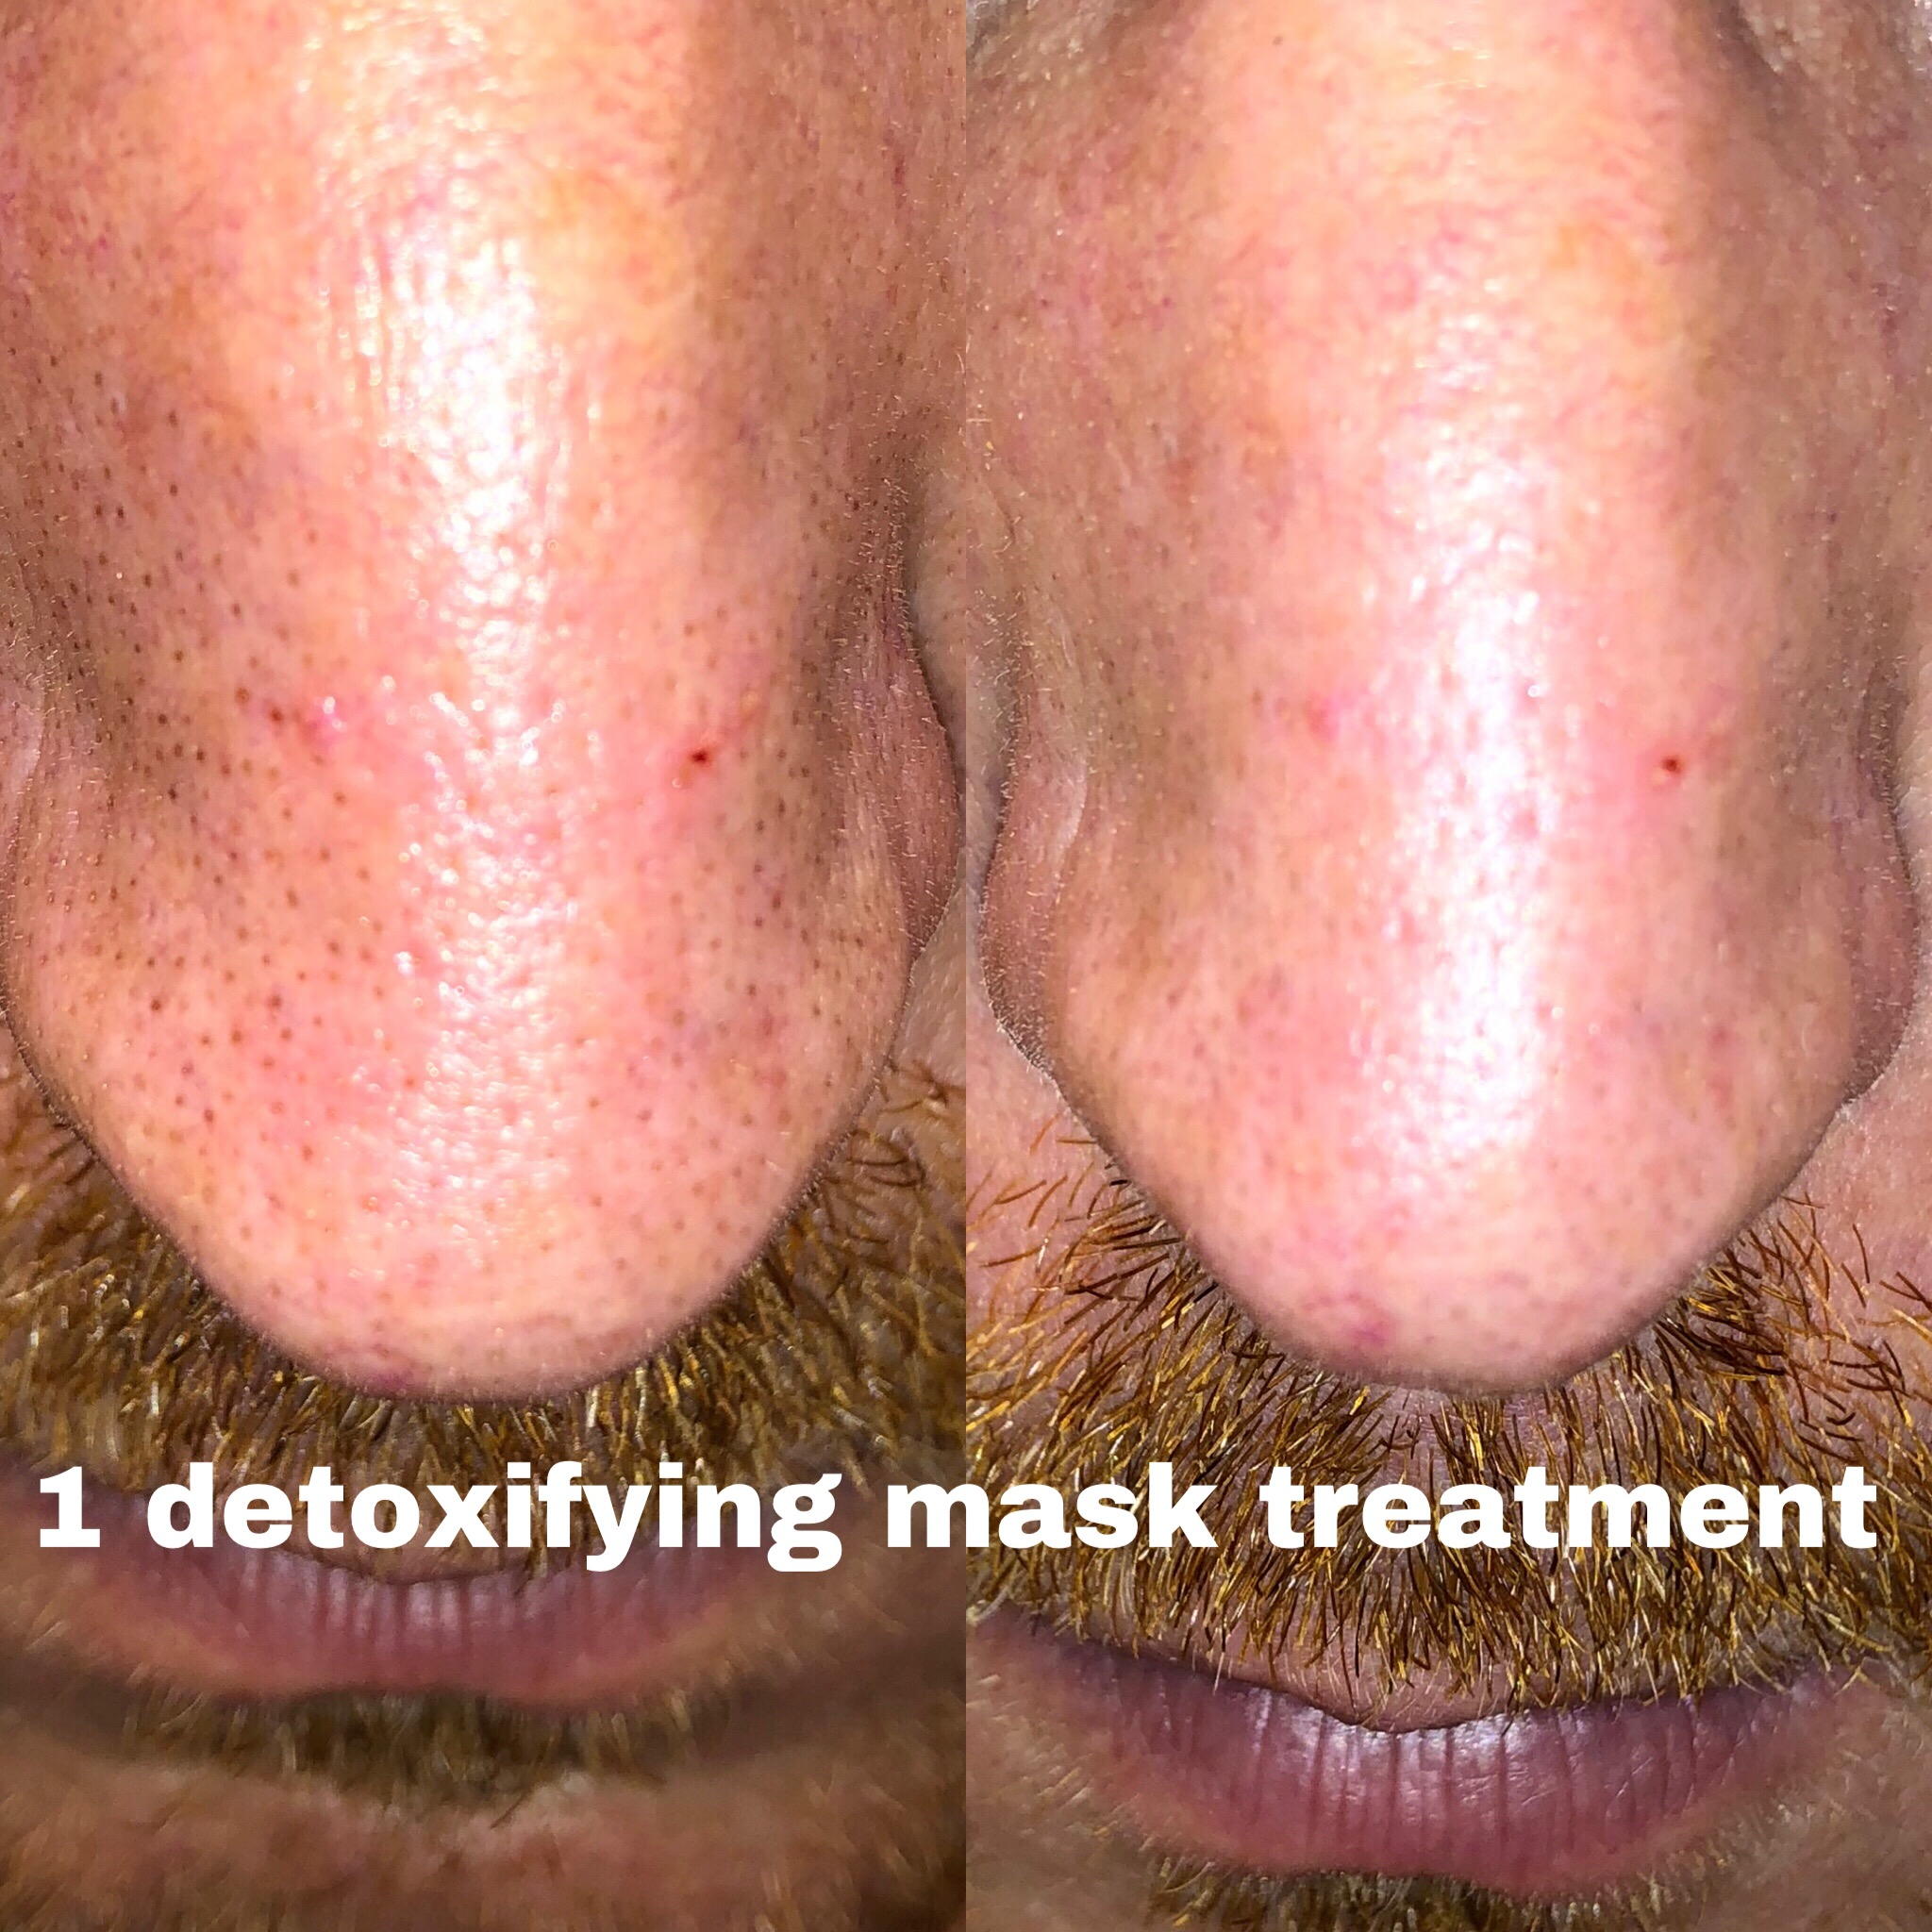 detox facial treatment-acne treatment alt text